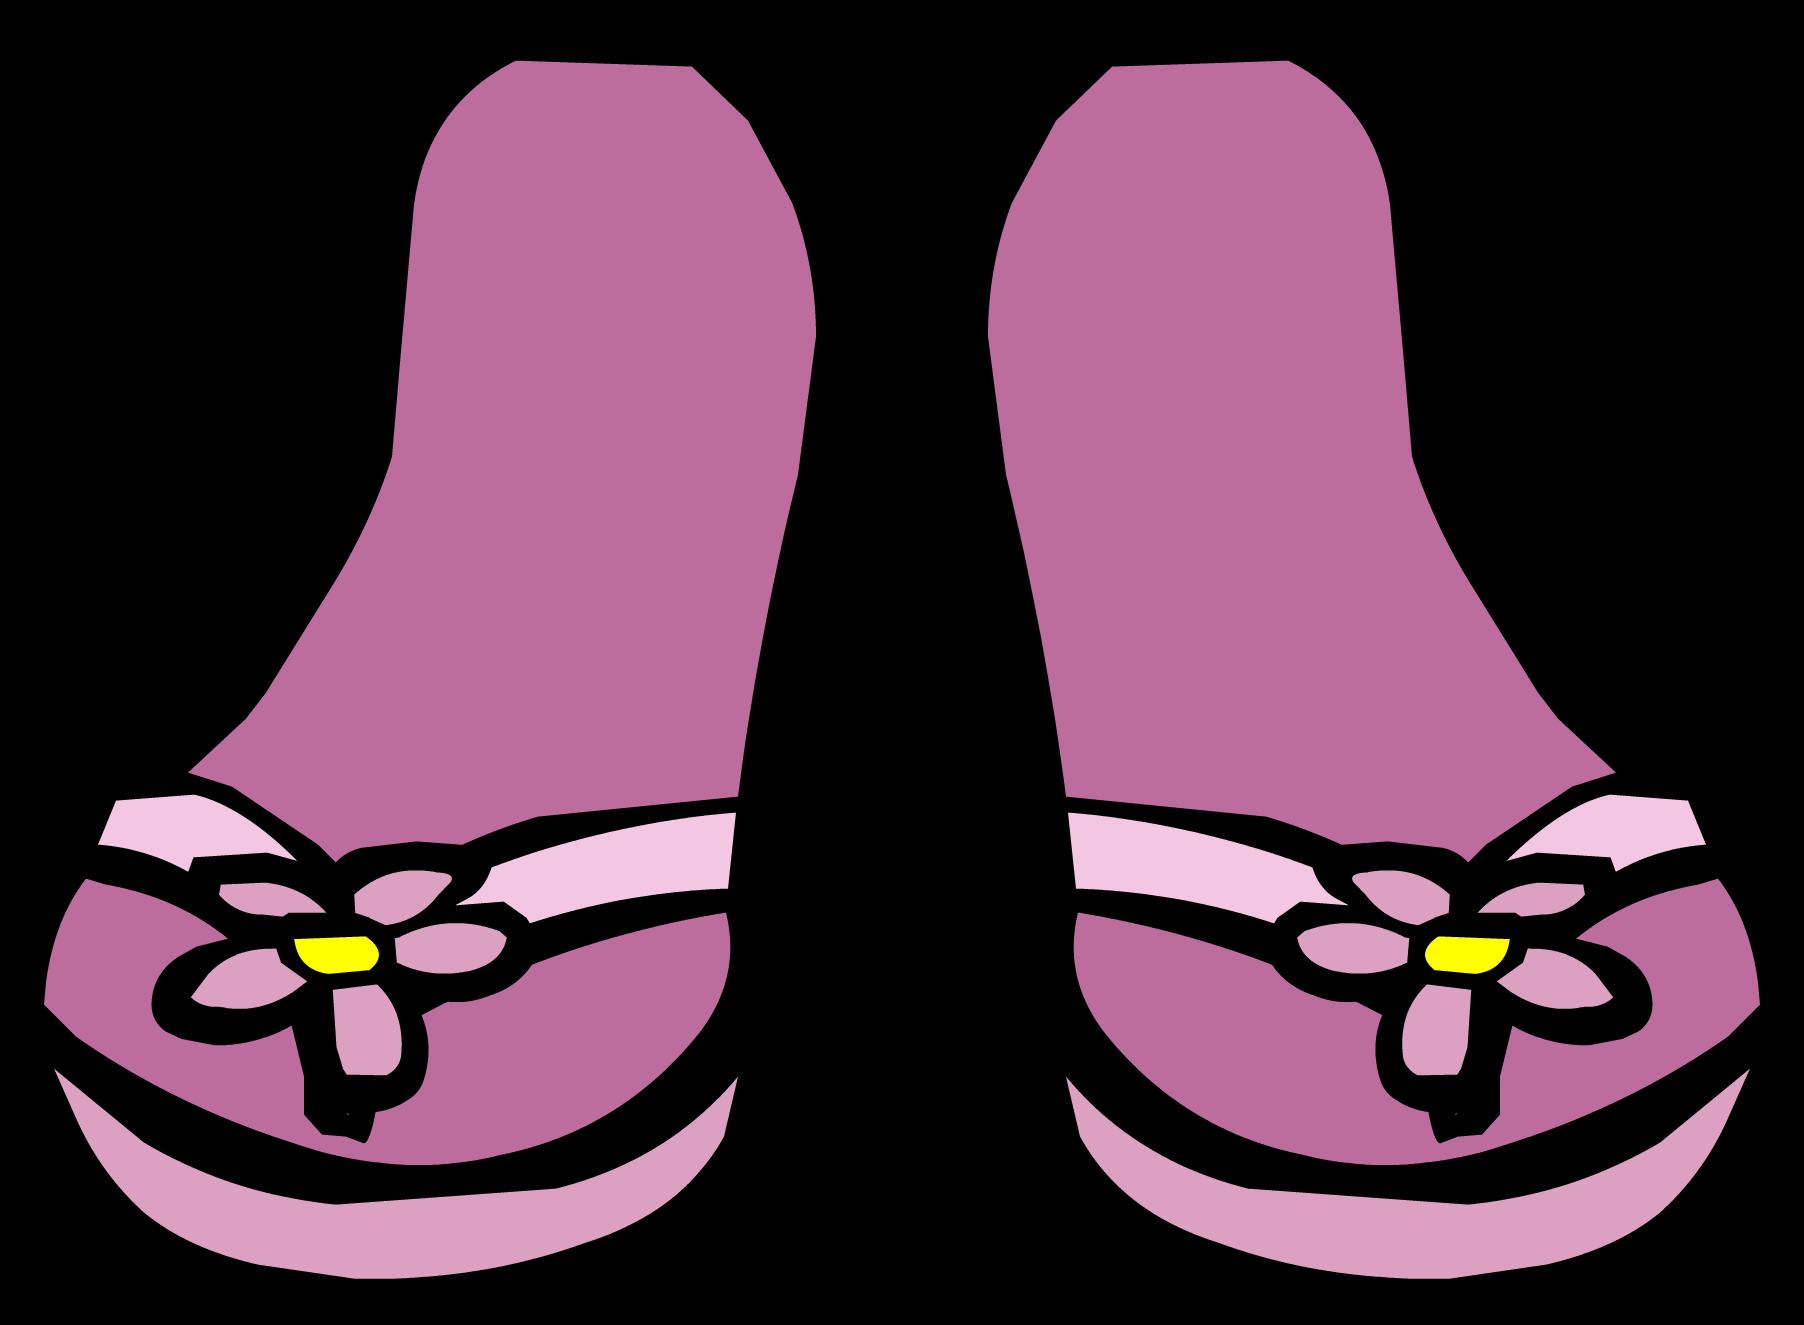 Flower flip flops clipart. Pink sandals club penguin